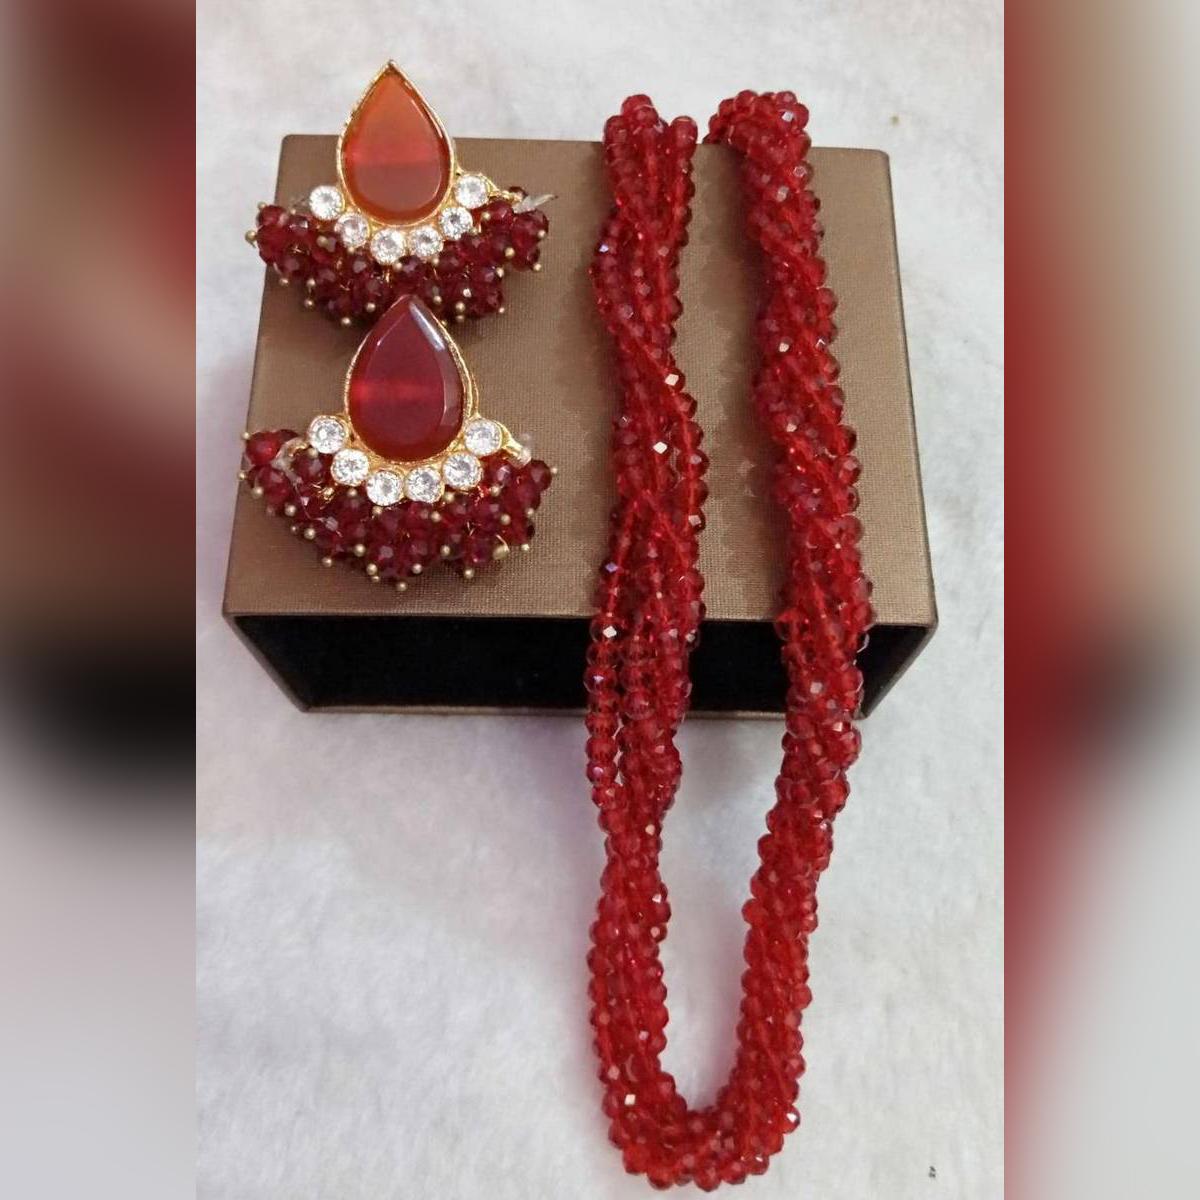 - Set mala styles fashionable design new look   Zarcun set gold plated  - Long lasting Polish - Famous jewellery - Fashionable design